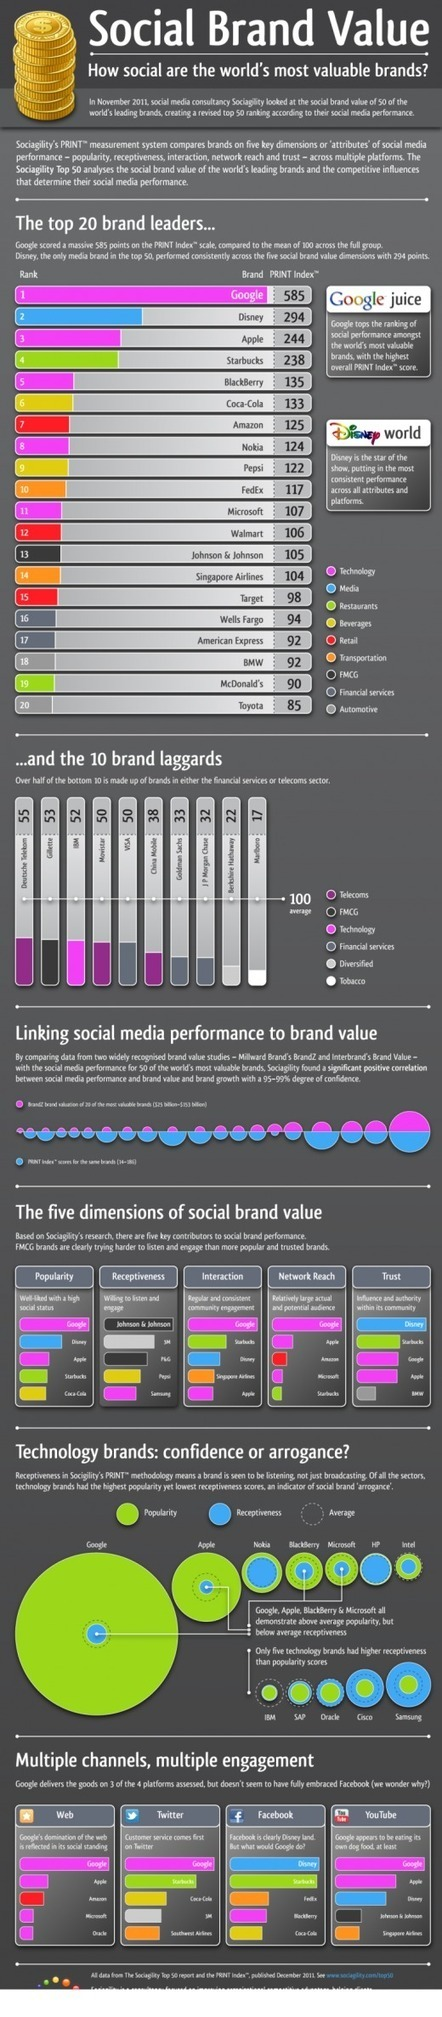 #Infografia de como valorar tu marca social | Gabriel Catalano human being | #INperfeccion® a way to find new insight & perspectives | Scoop.it